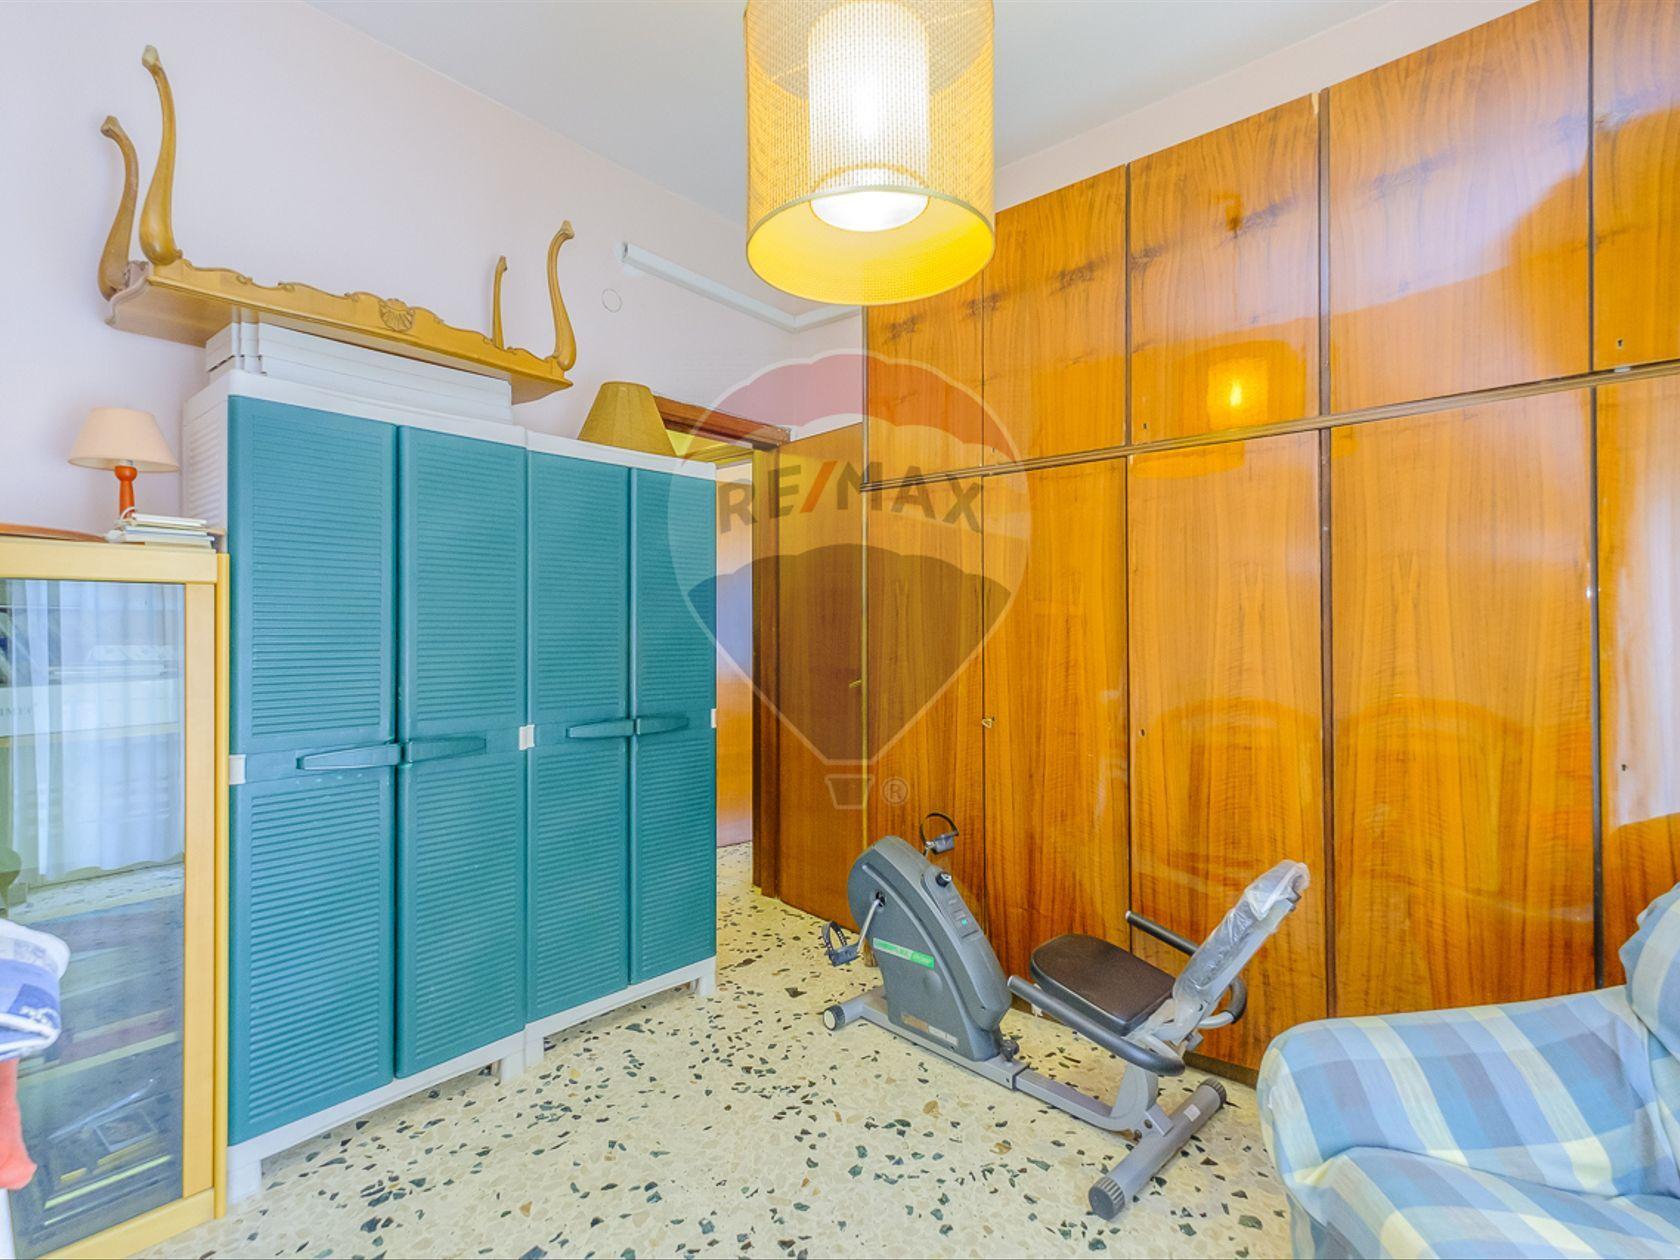 Appartamento Siracusa- Scala Greca S. Panagia Teracati Zecchino, Siracusa, SR Vendita - Foto 15